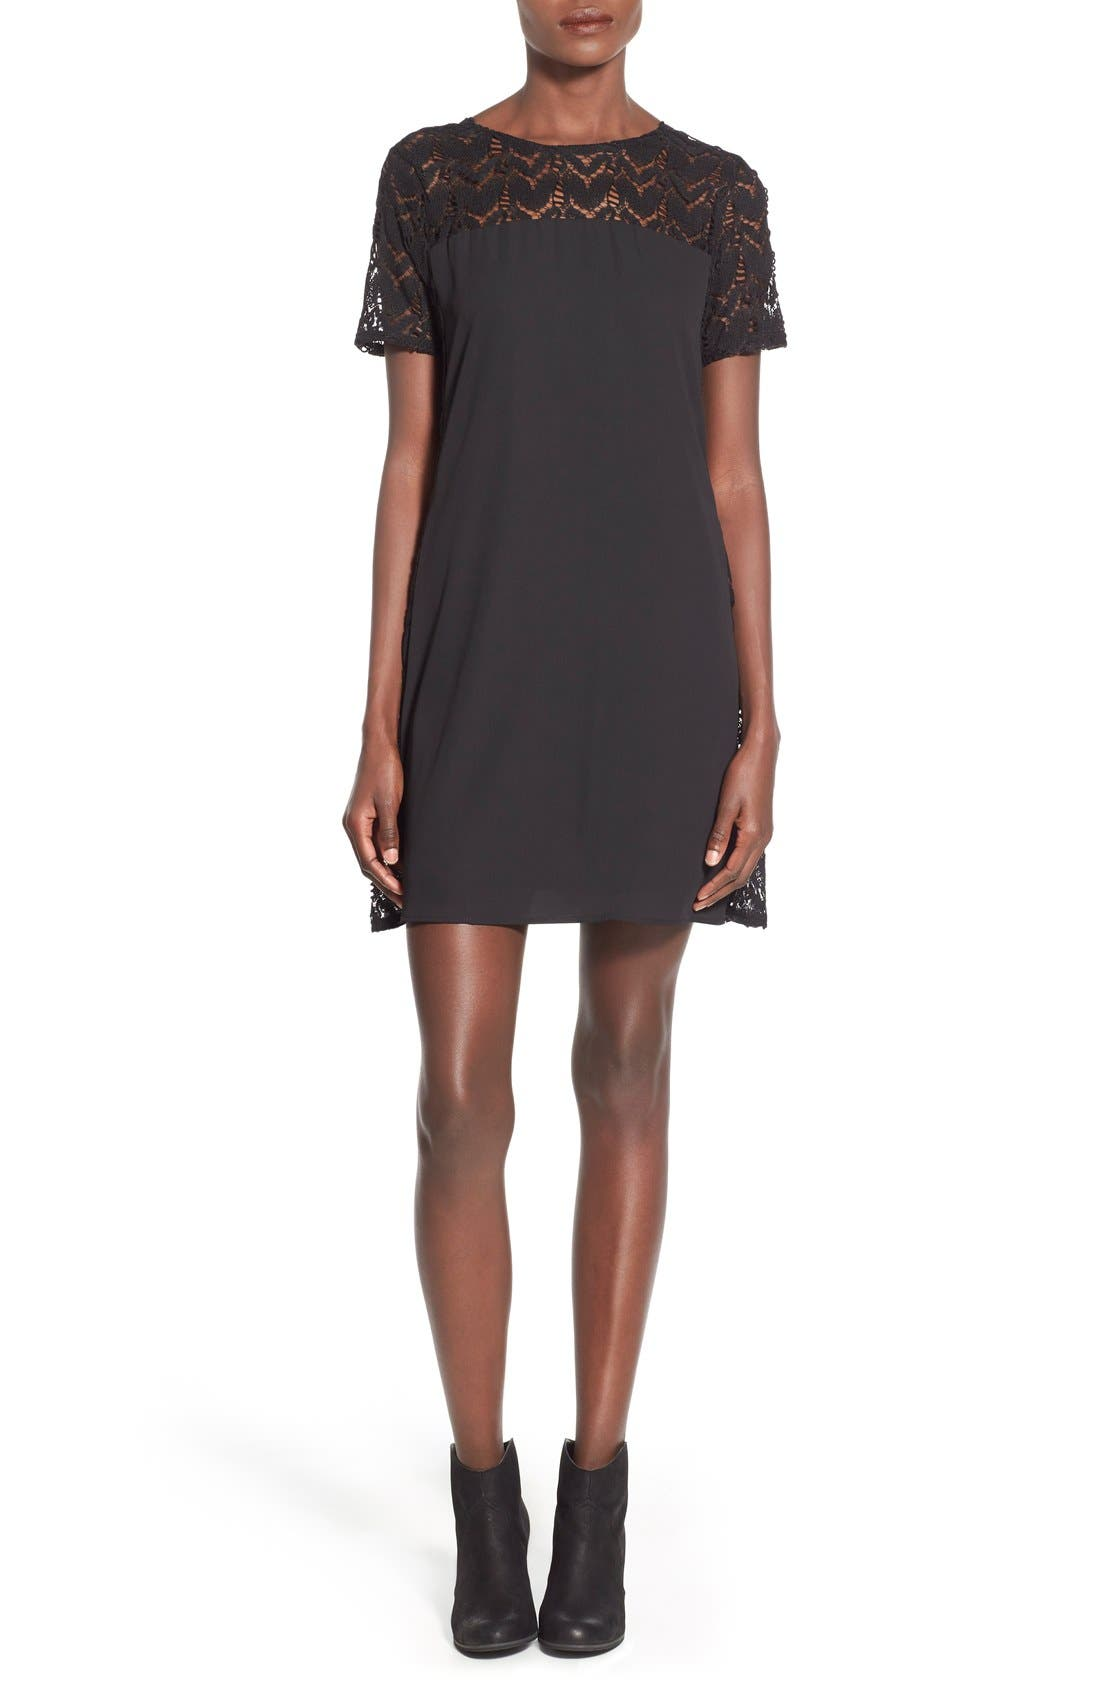 Alternate Image 1 Selected - BP. Lace Yoke Scoop Back Shift Dress